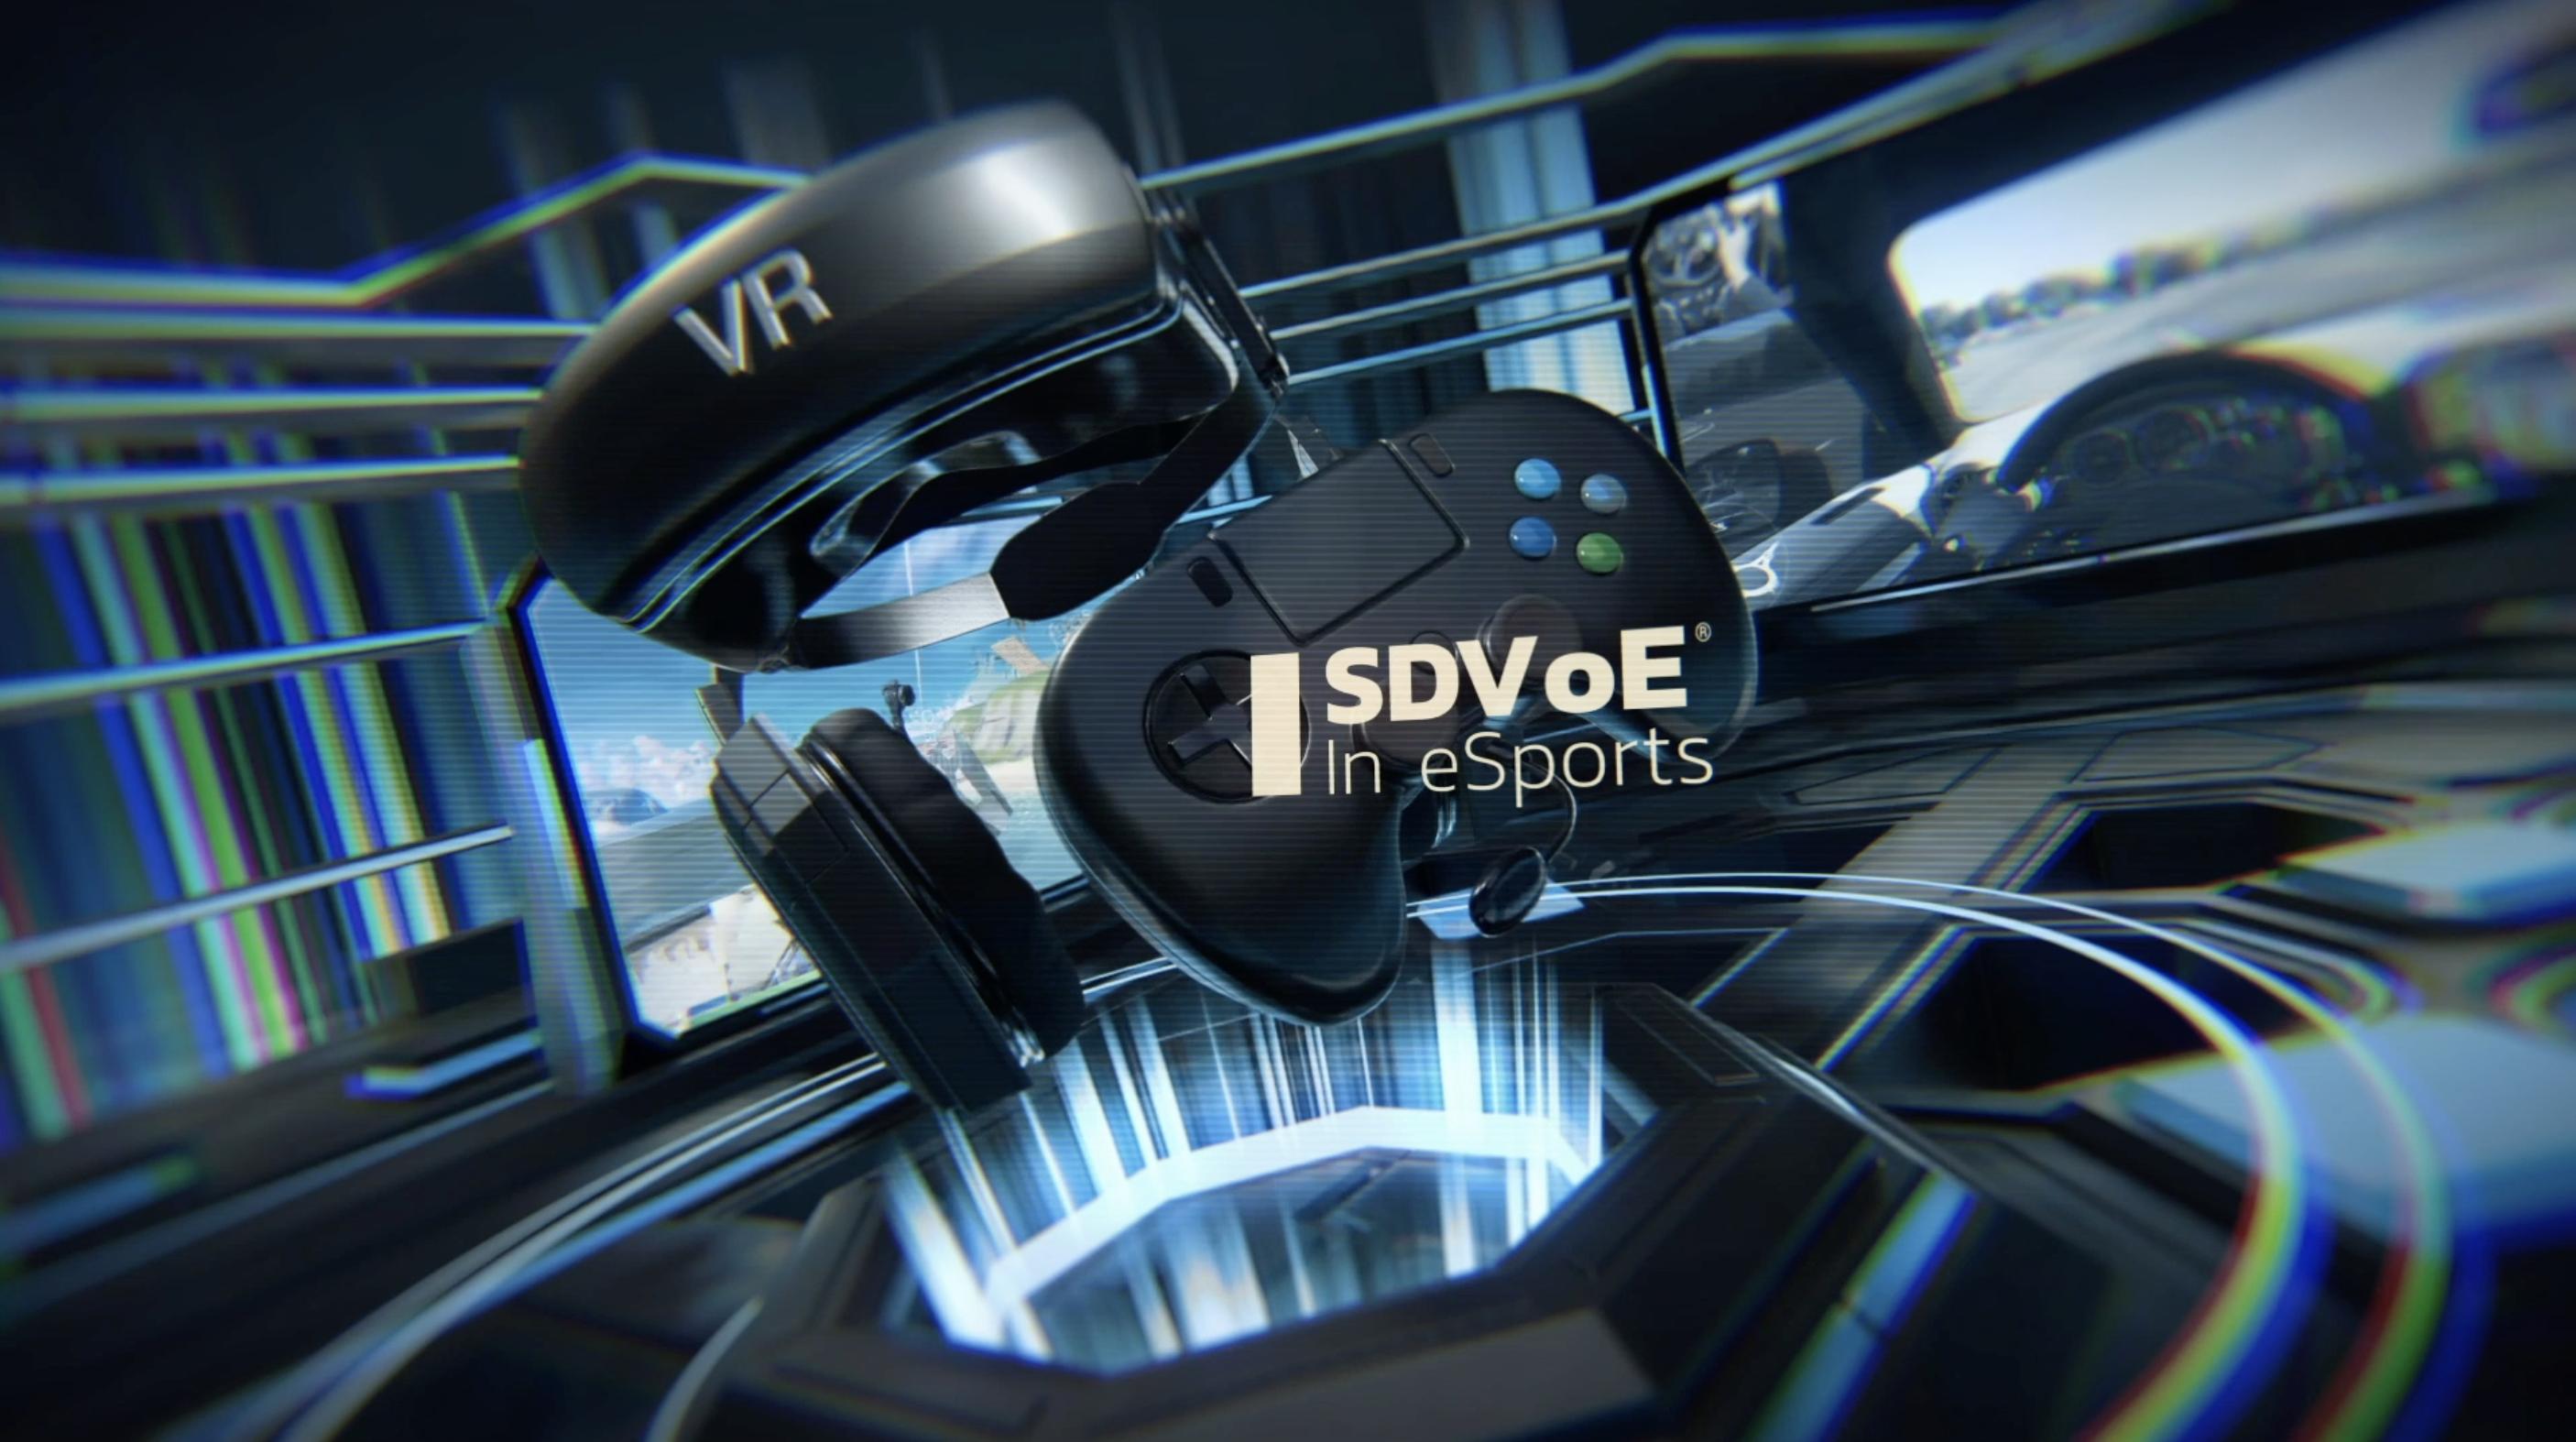 SDVoE in eSports